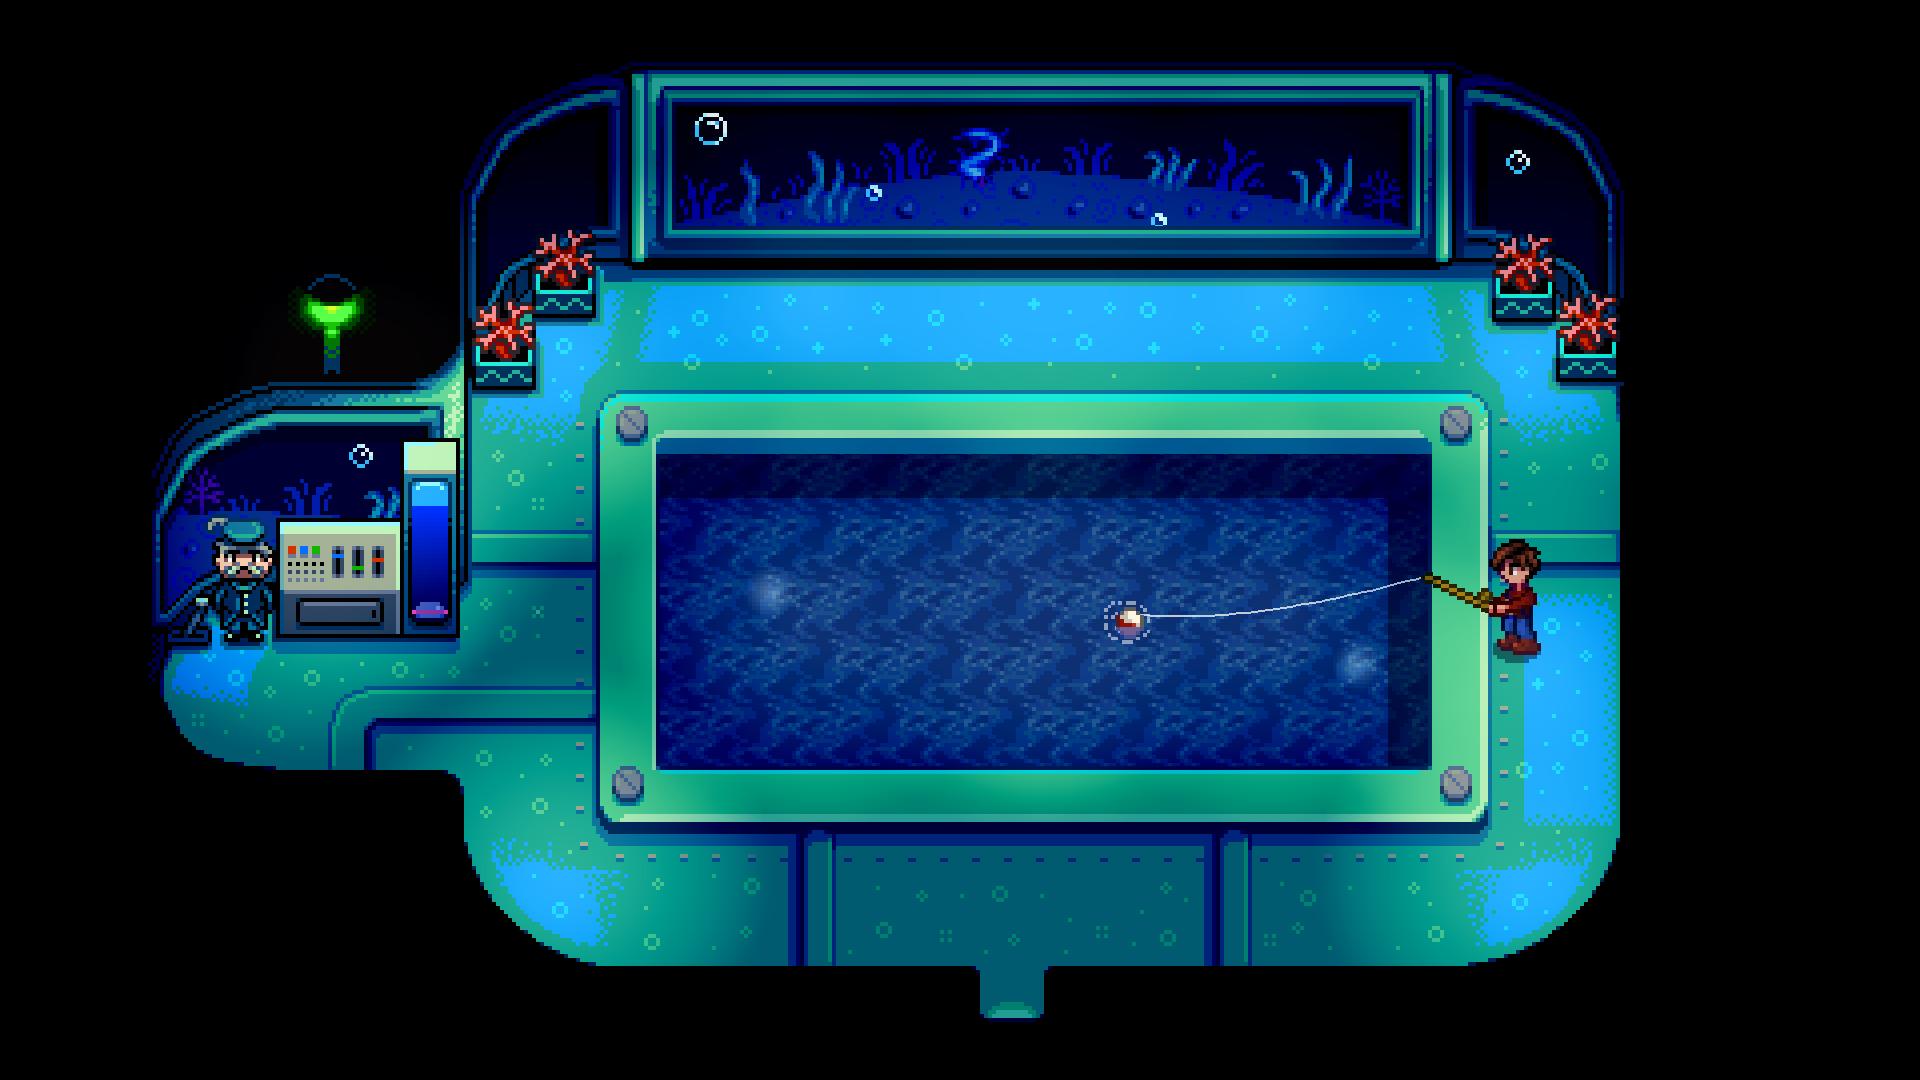 Stardew Valley Multiplayer Beta Deep-Sea Fishing